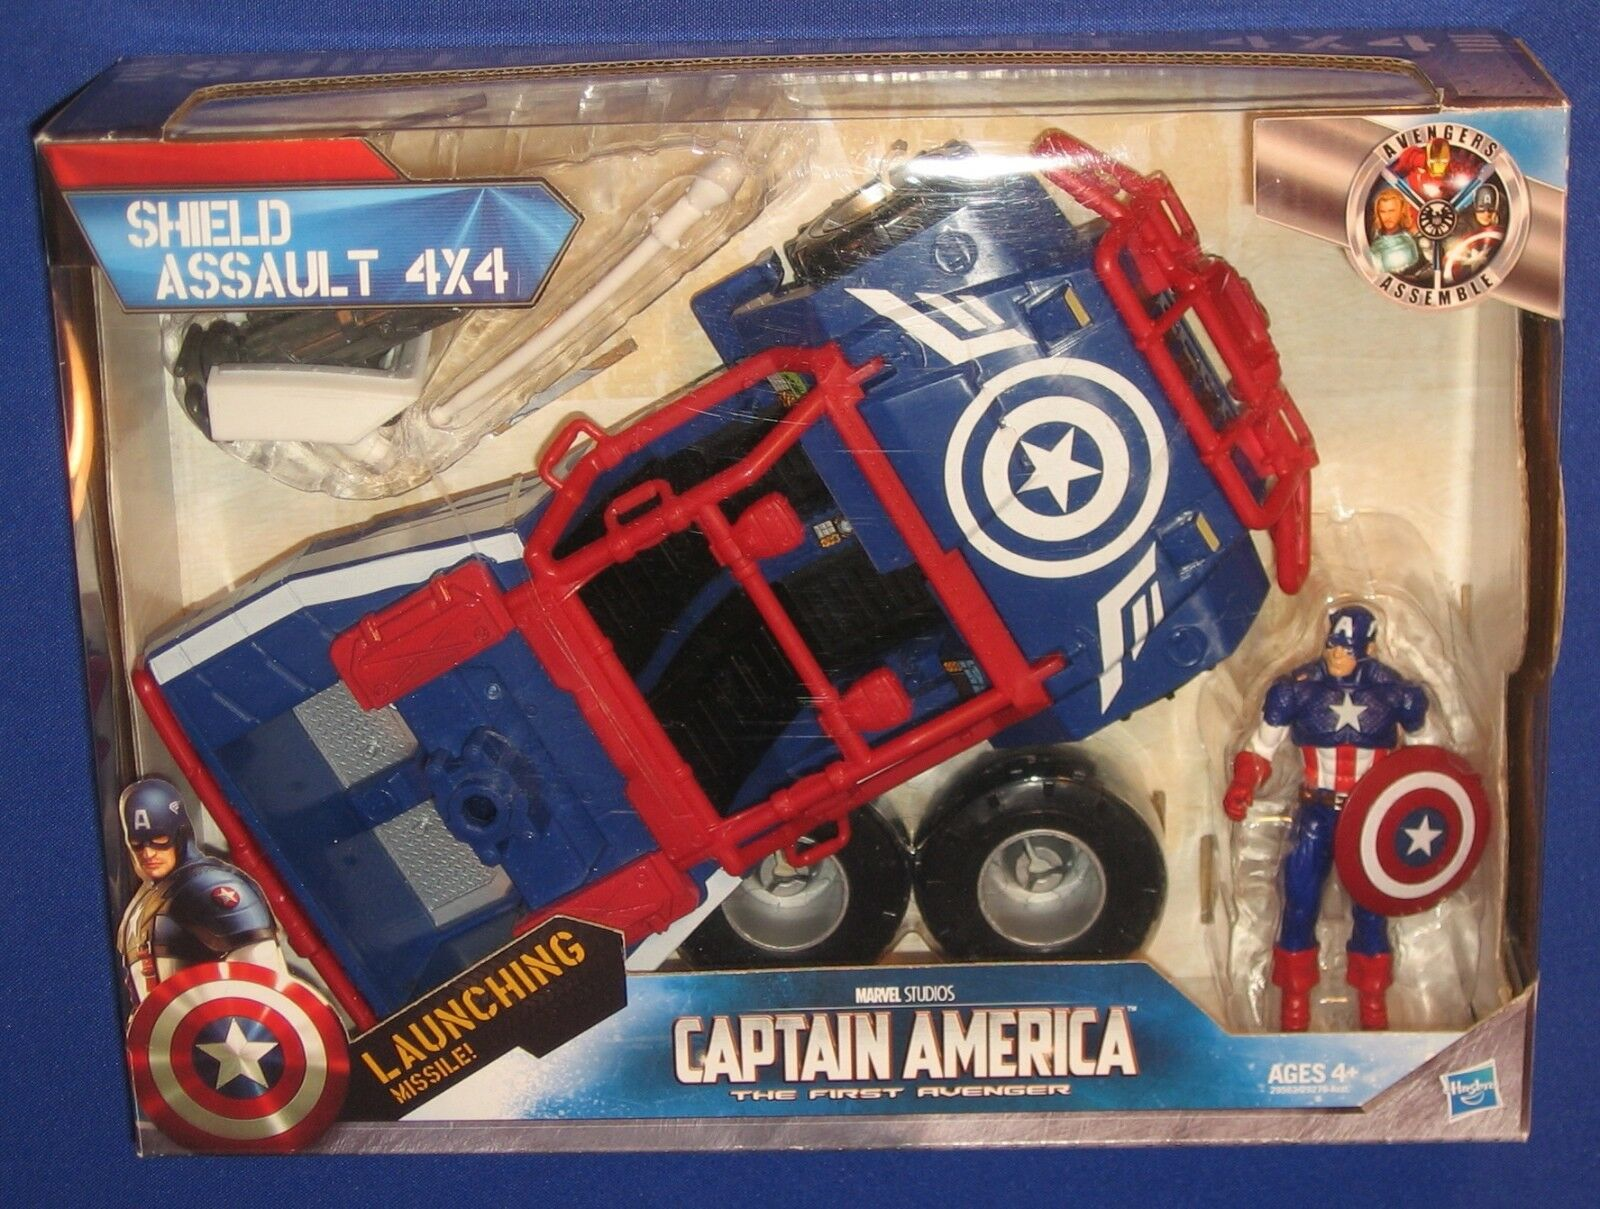 Marvel SHIELD Assault 4x4 Vehicle 2010 MIB Captain America 4  Action Figure Jeep